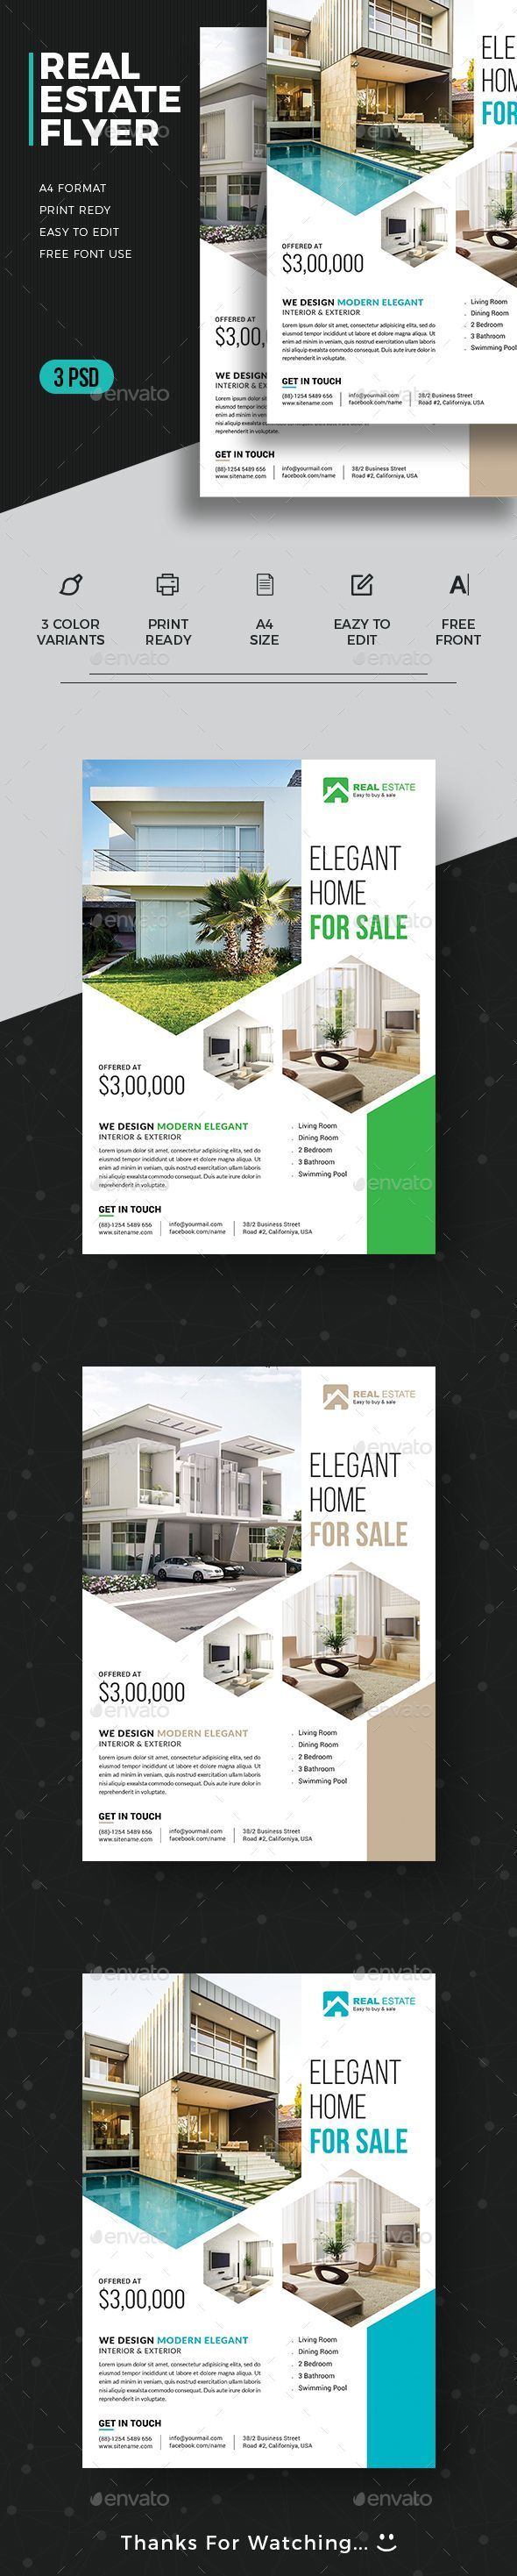 #Real #Estate #Flyer - Commerce Flyers Download here: https://graphicriver.net/item/real-estate-flyer/19550607?ref=alena994 #howdoibecomearealestateagent